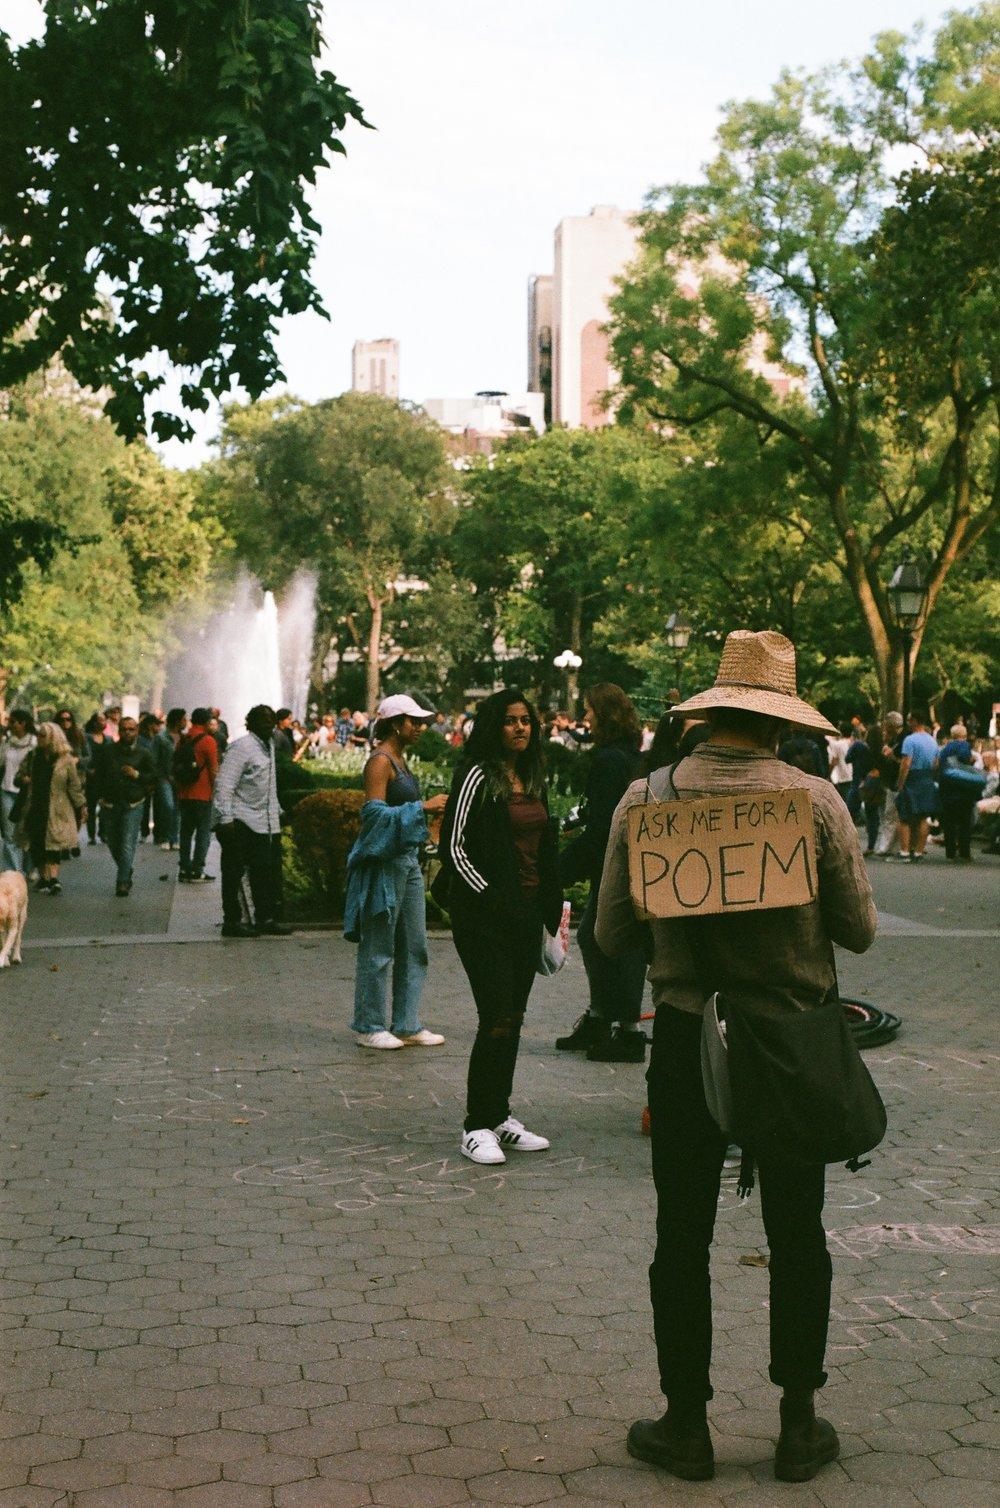 The Park Poet,Washington Square Park, September 2017